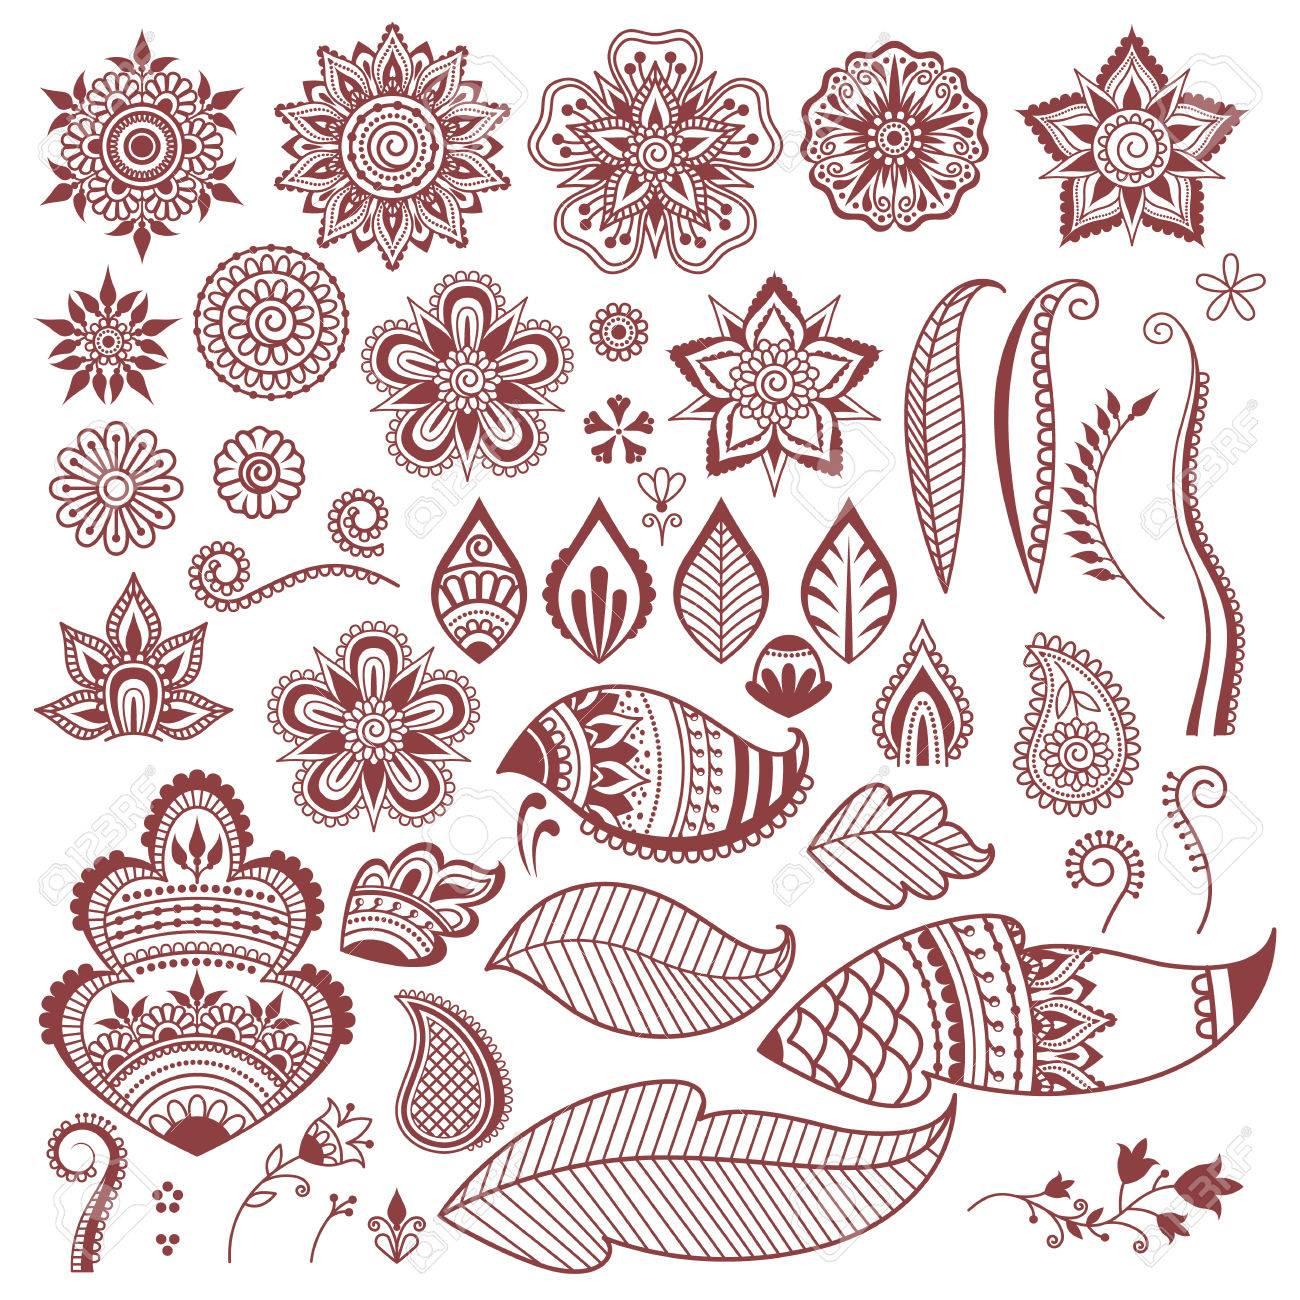 Mehndi Henna Tattoo Flowers And Leaves Elements Set Ethnic Beauty